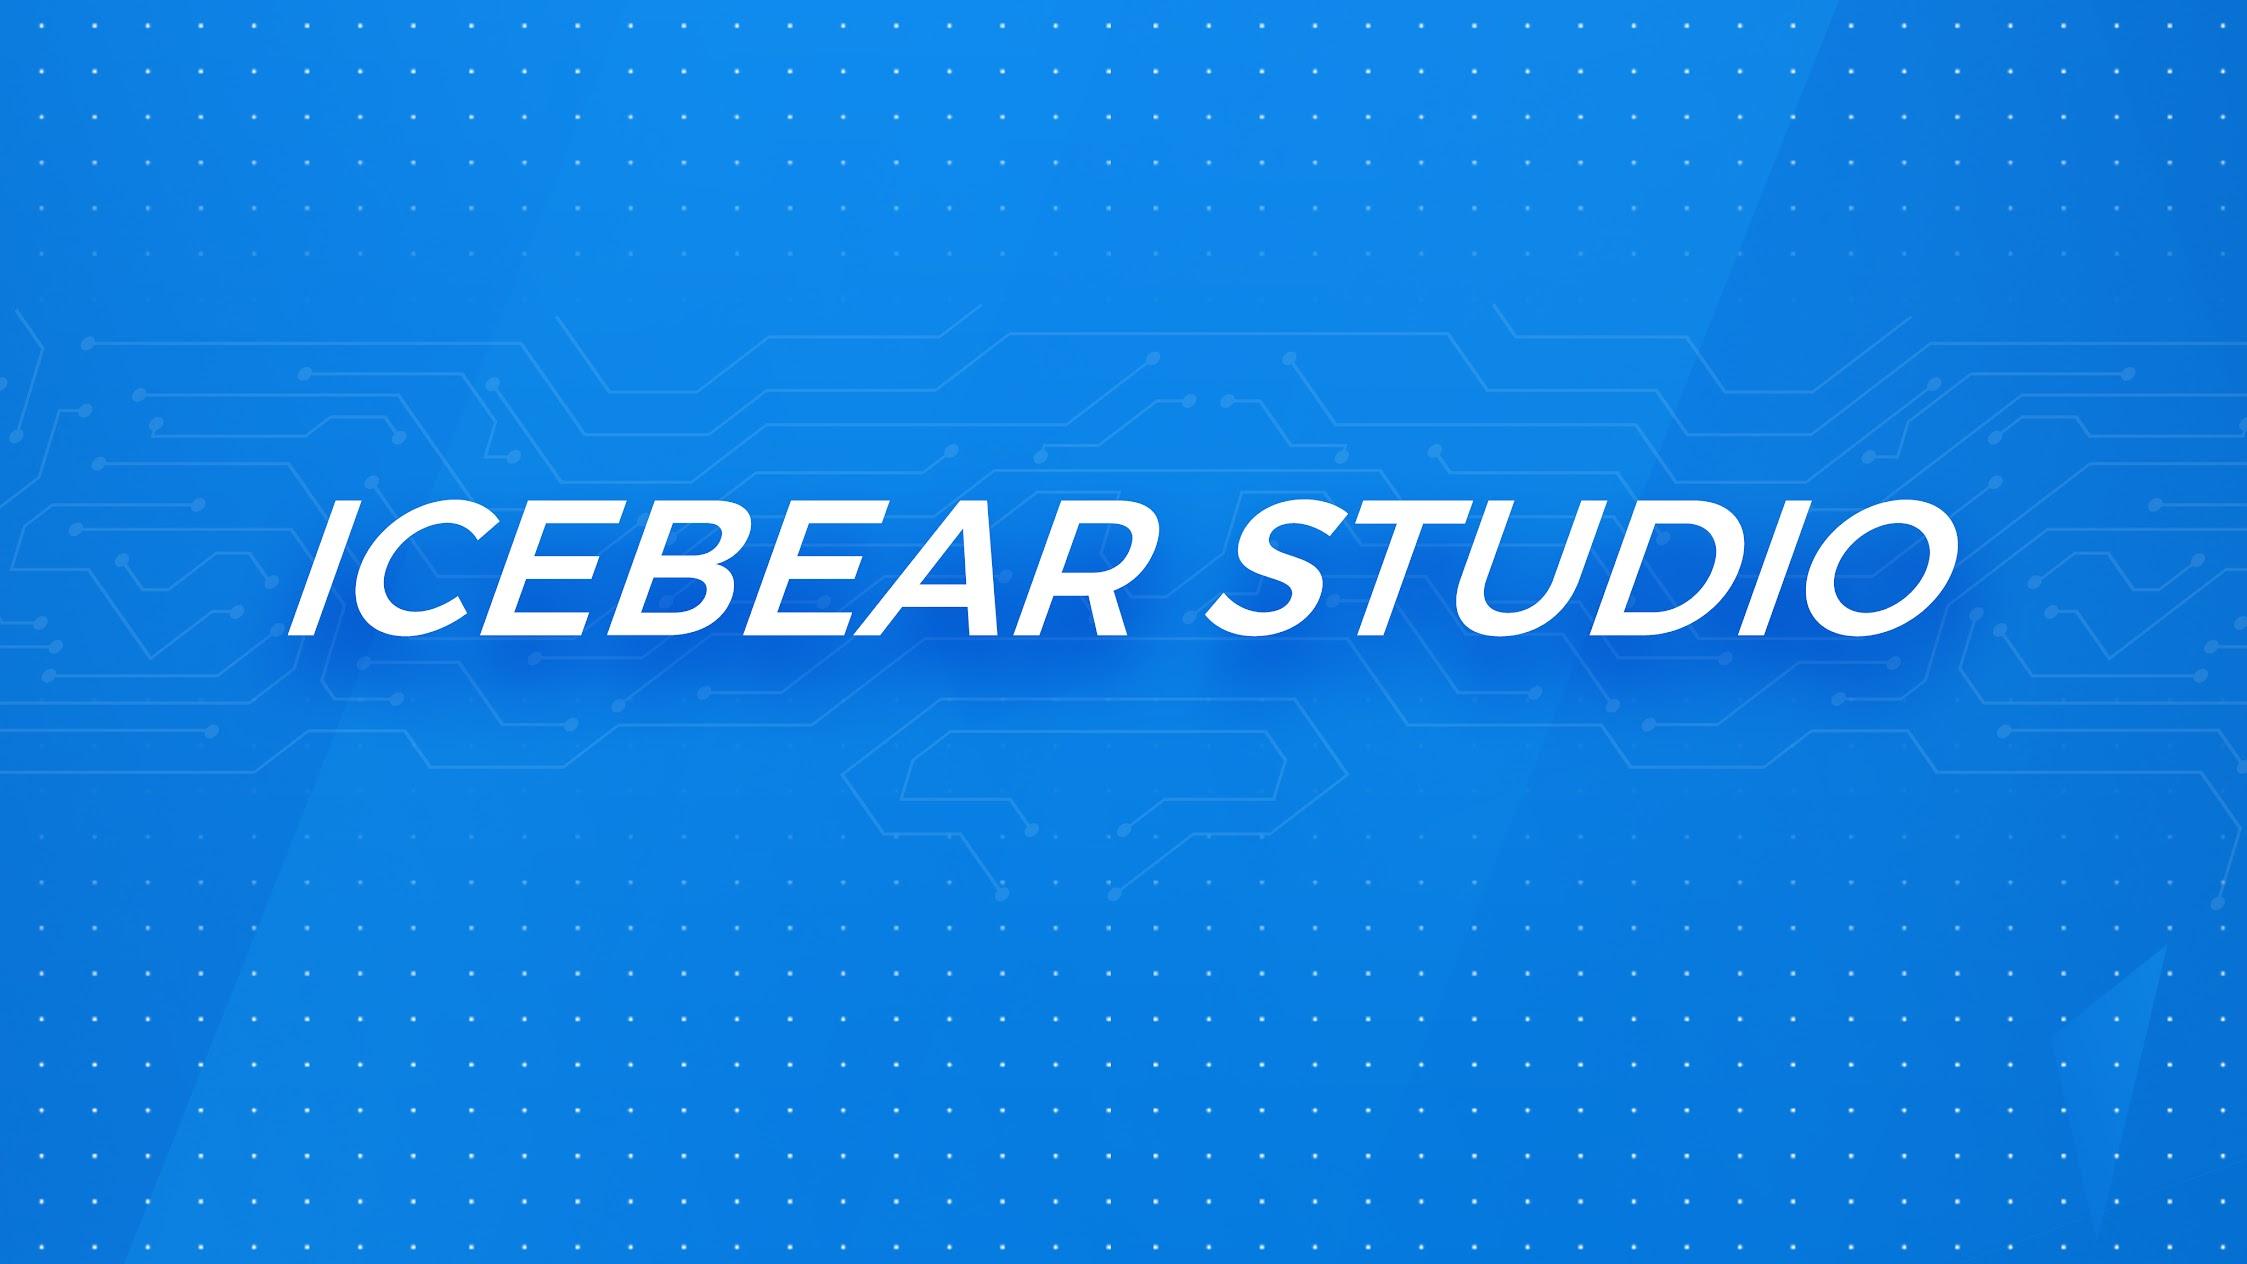 IceBear Studio